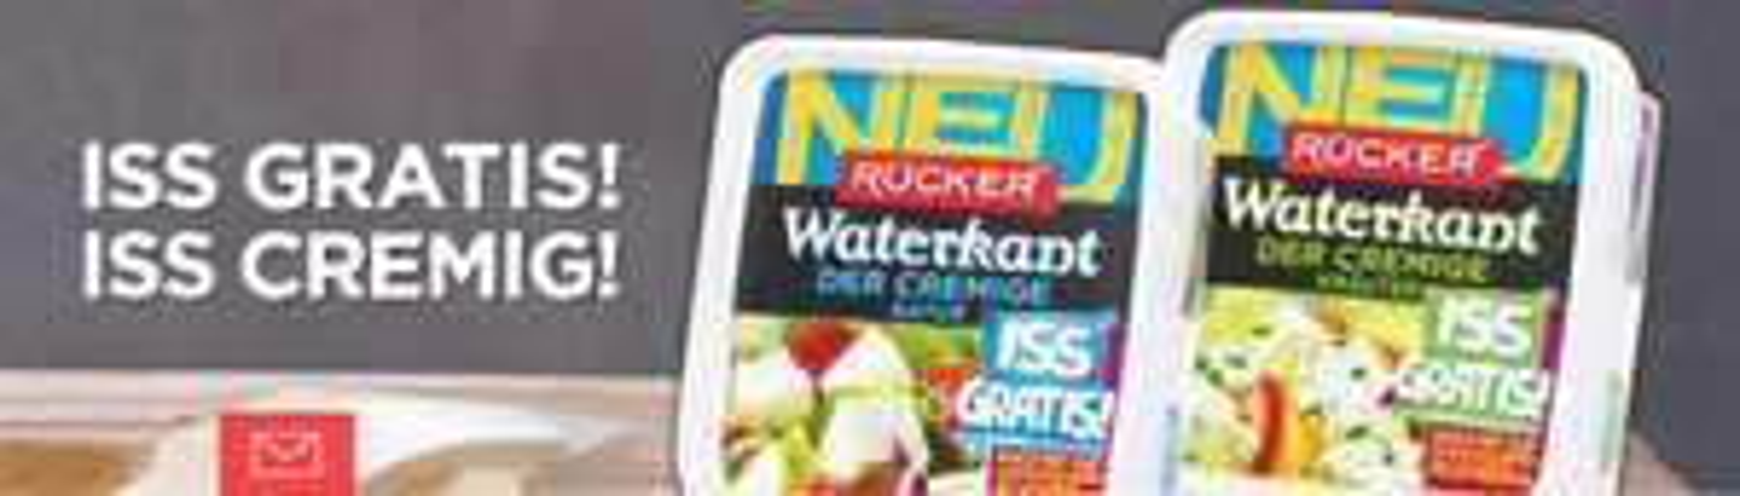 *Gratis testen* Rücker Waterkant (früher Cremas) - Der Cremige - Natur / Kräuter Käse